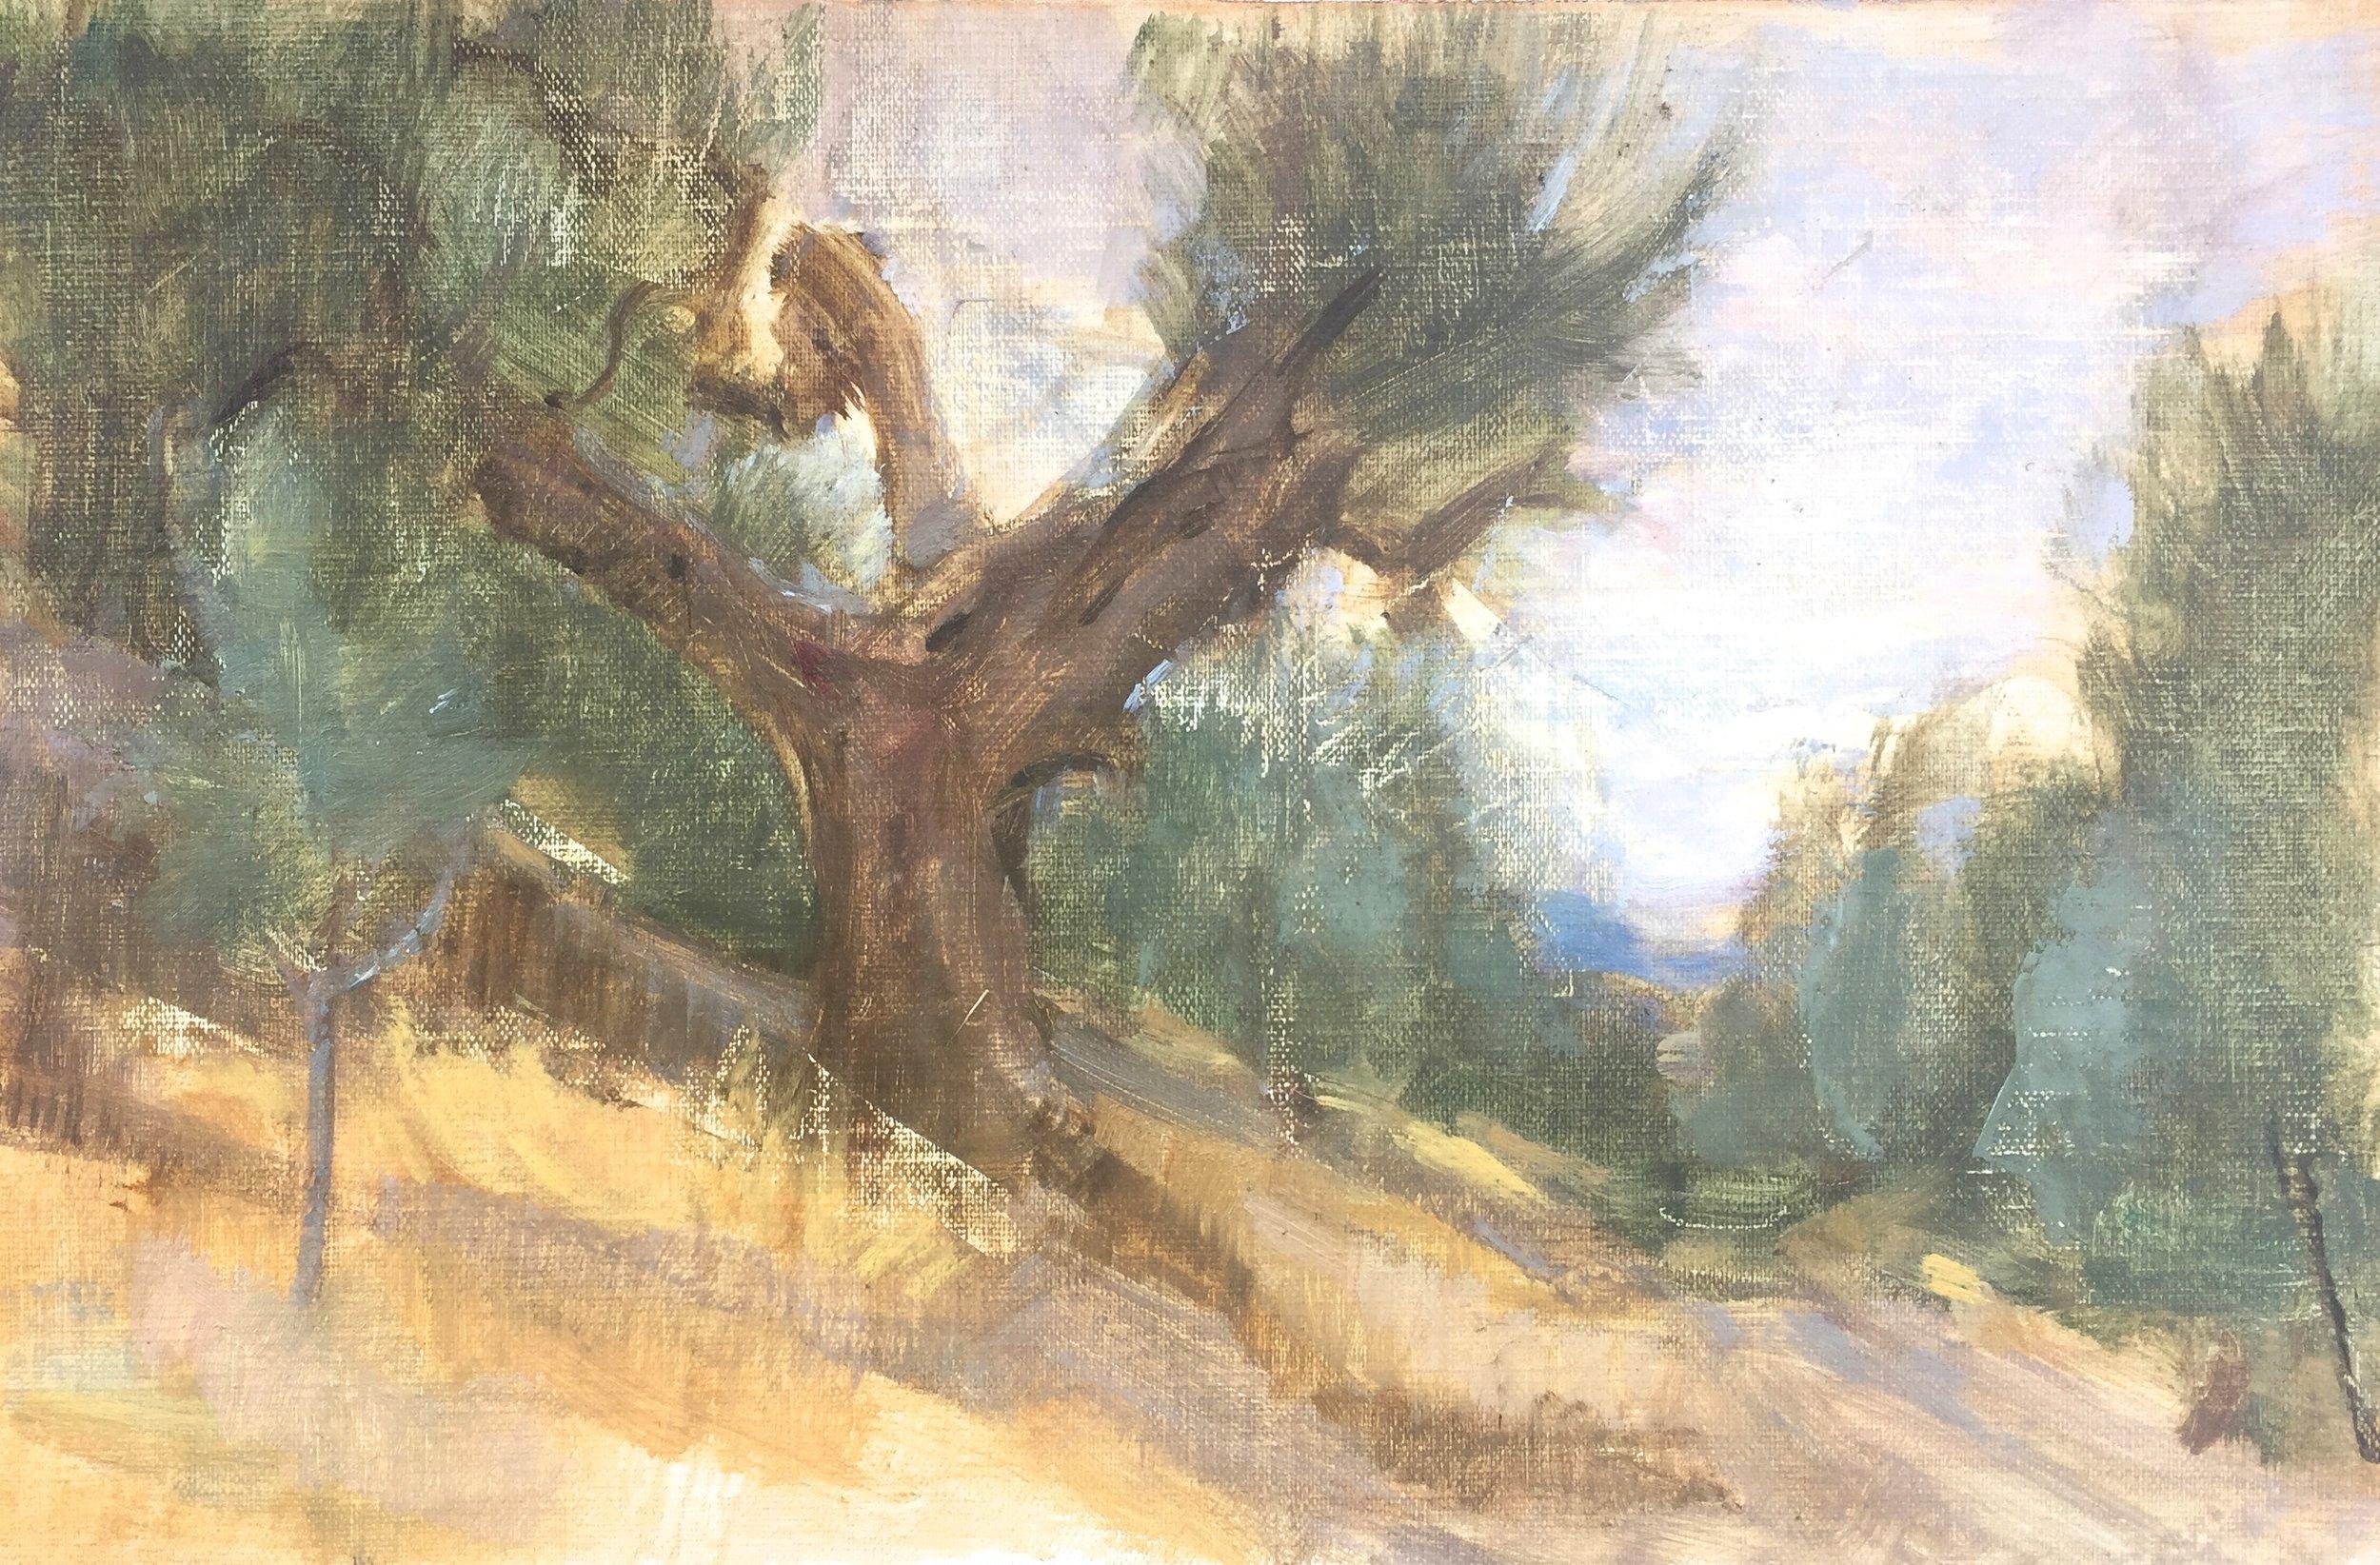 Spedalone Olive Grove, Tuscany